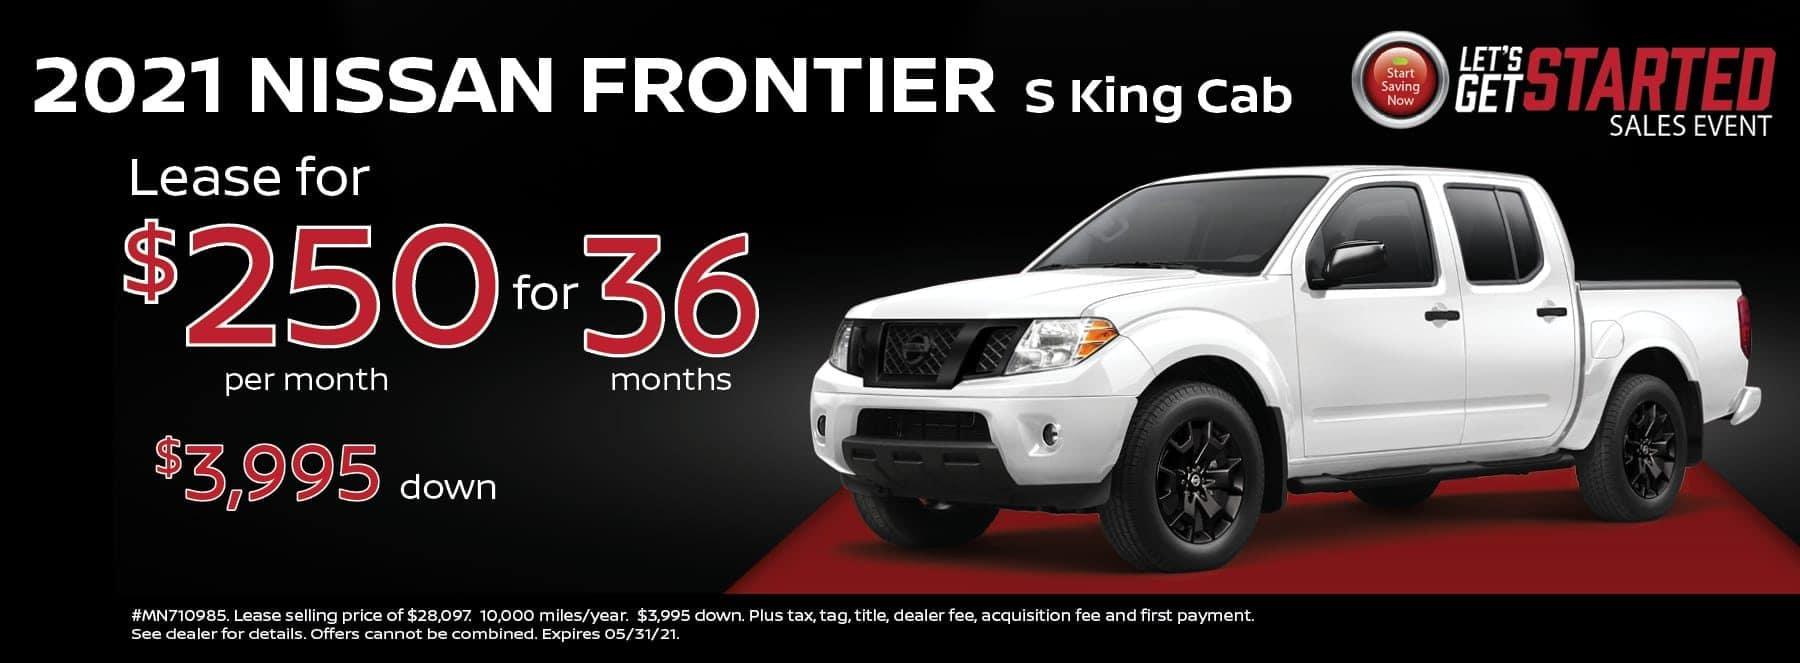 21 Frontier 250 mo